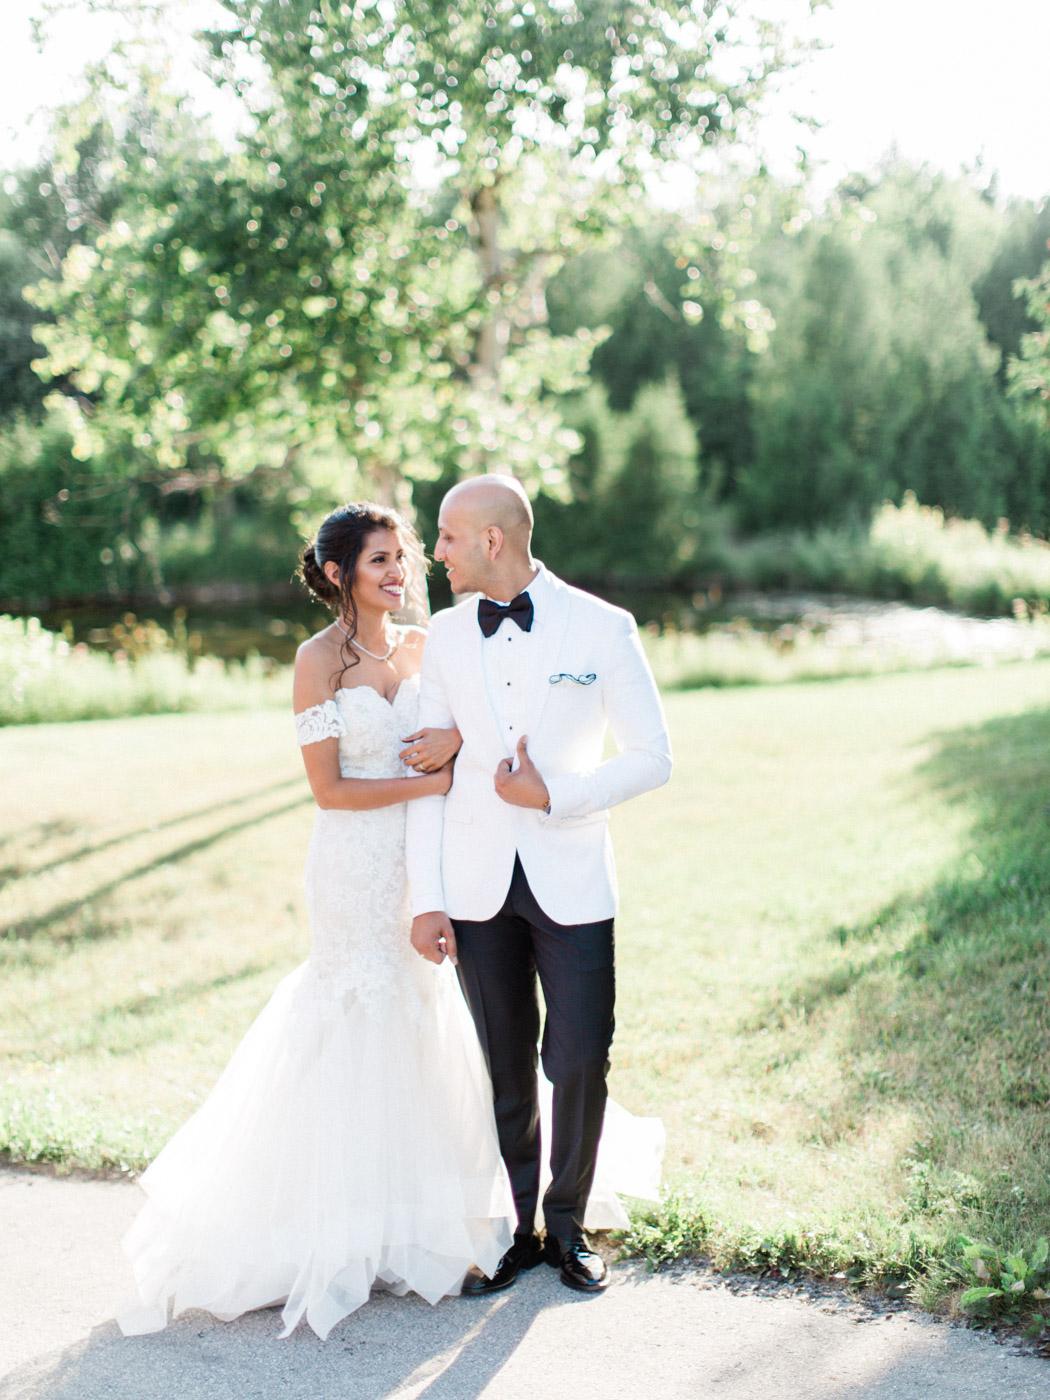 Toronto-Collingwood-wedding-photographer-indian-wedding-documentary139.jpg